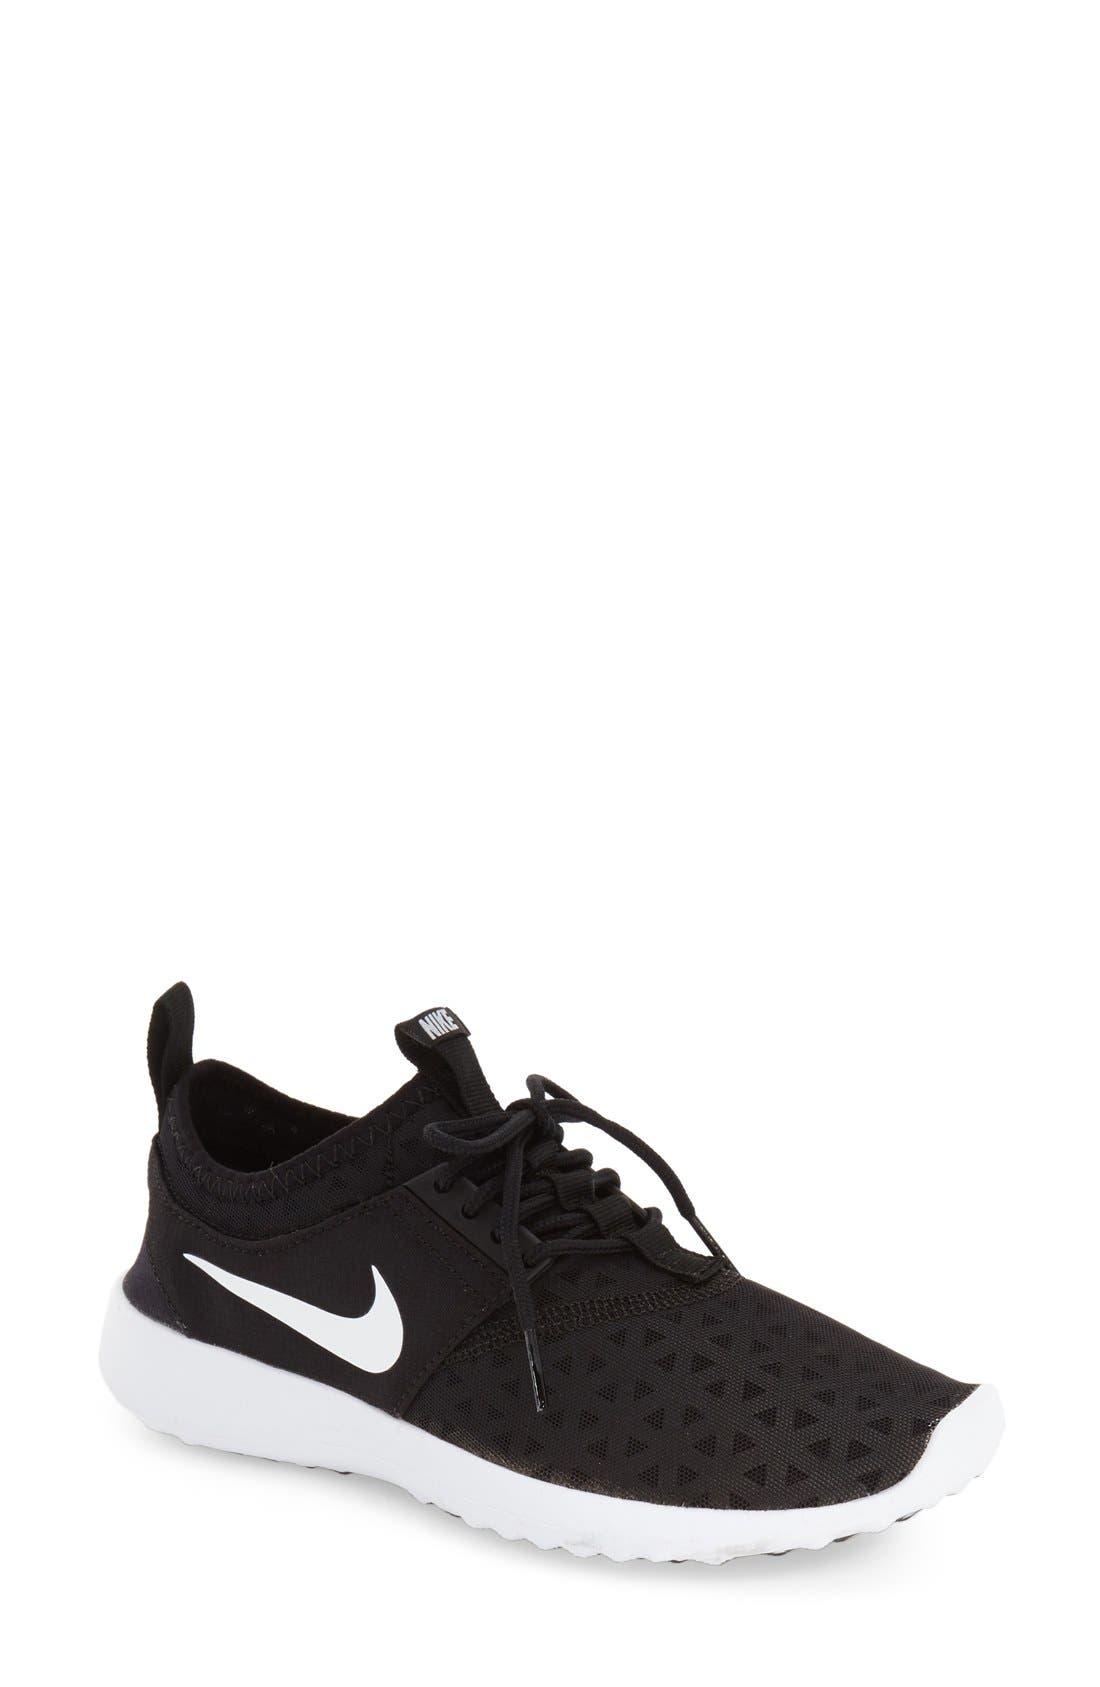 Main Image - Nike 'Juvenate' Sneaker (Women)